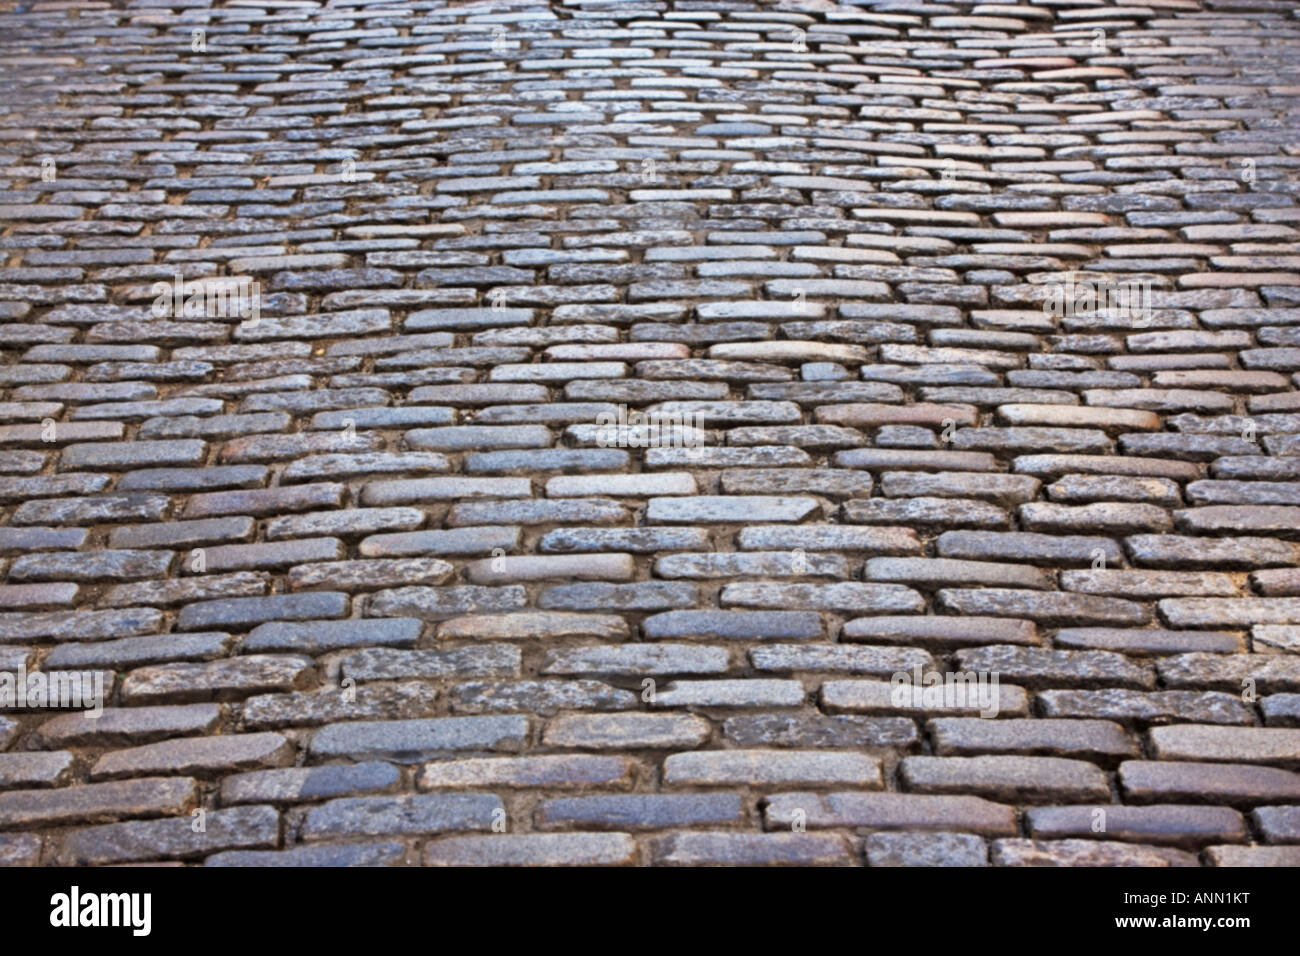 cobblestone street - Stock Image